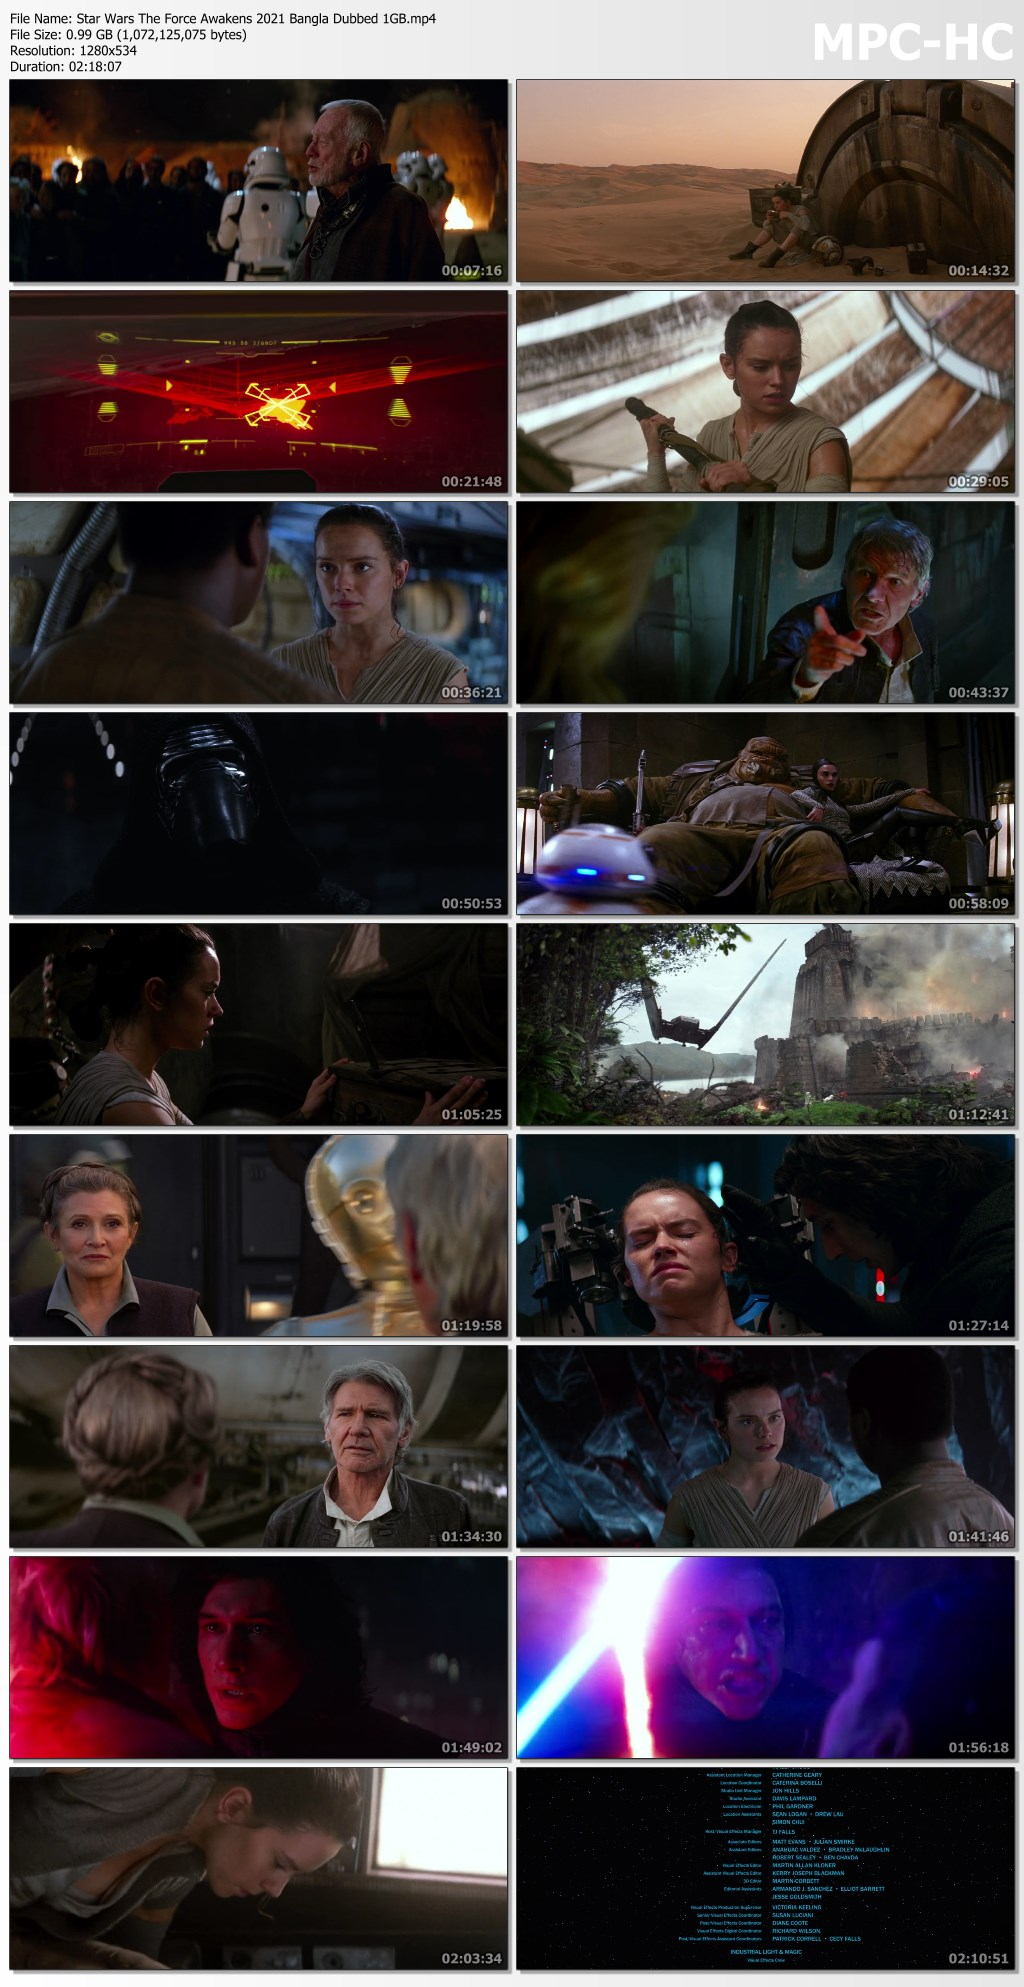 Star Wars The Force Awakens 2021 Bangla Dubbed 1GB.mp4 thumbs